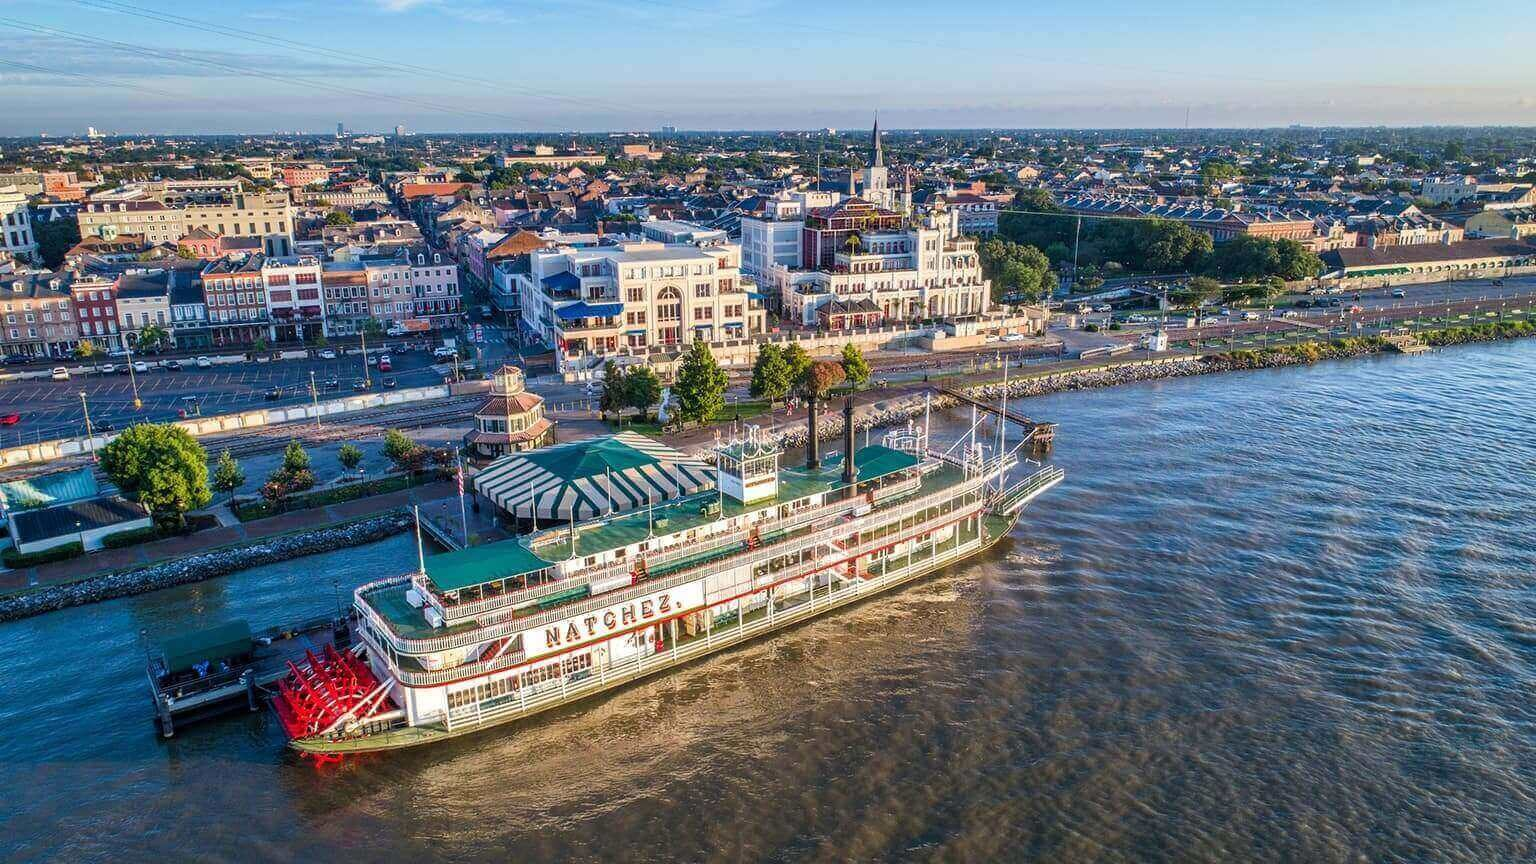 Steamboat River Boat Natchez docked on the Mississippi River